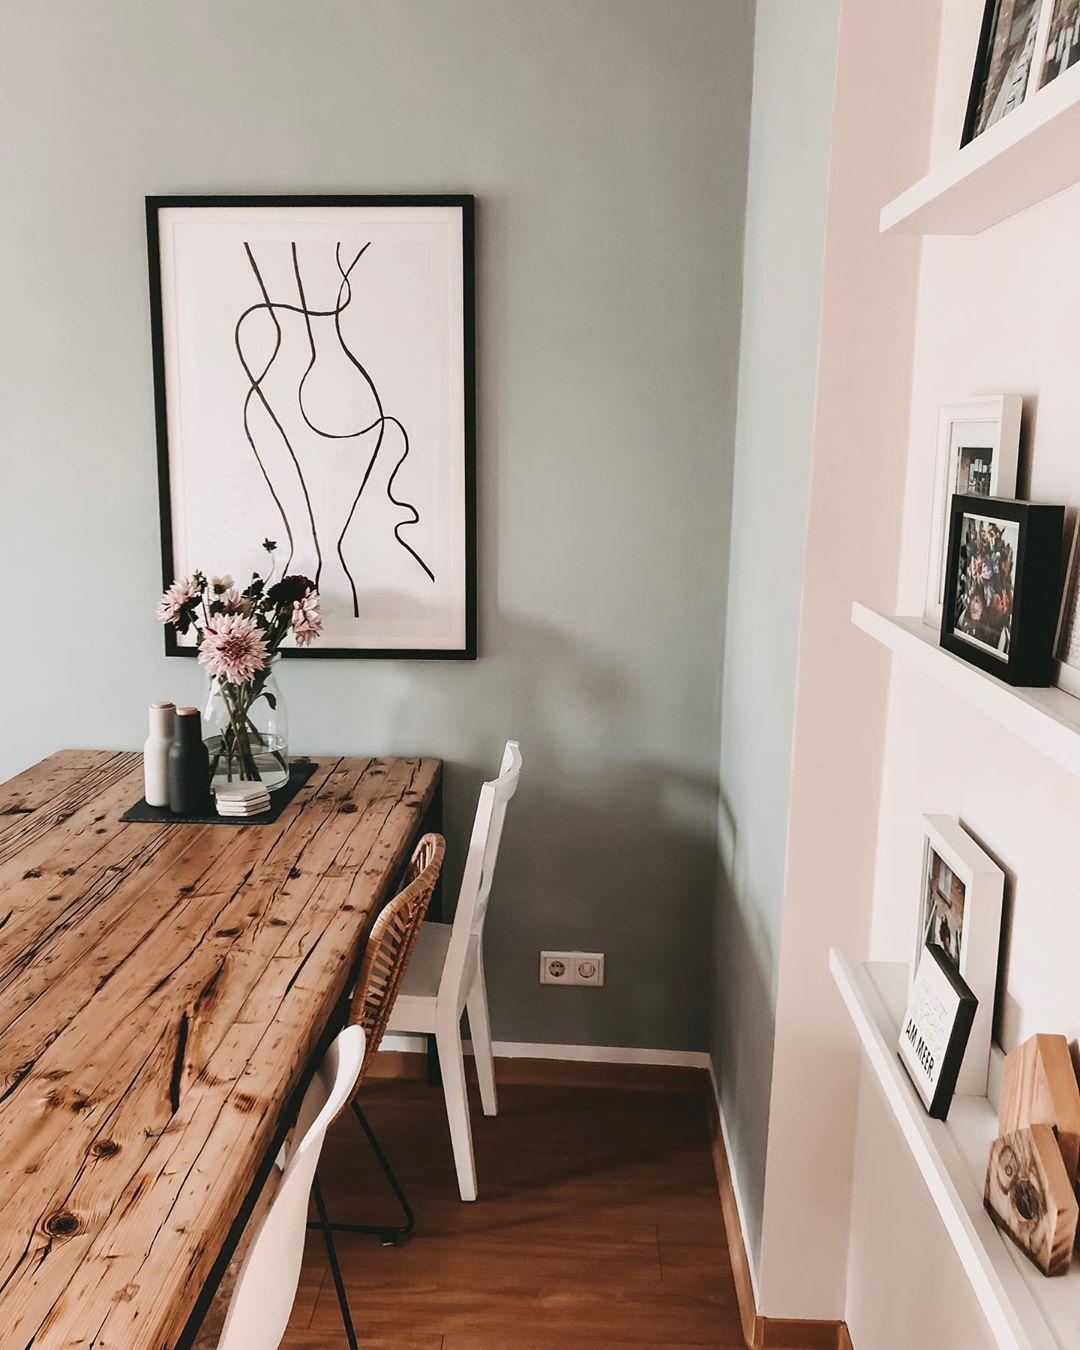 MIRA-MIRROR.COM (@miiramirror) • #table #woodtable #esszimmer #wandfarbe #salbei Alpina Feine Farben Sanfter Morgentau #alpinafeinefarben MIRA-MIRROR.COM (@miiramirror) • #table #woodtable #esszimmer #wandfarbe #salbei Alpina Feine Farben Sanfter Morgentau #alpinafeinefarben